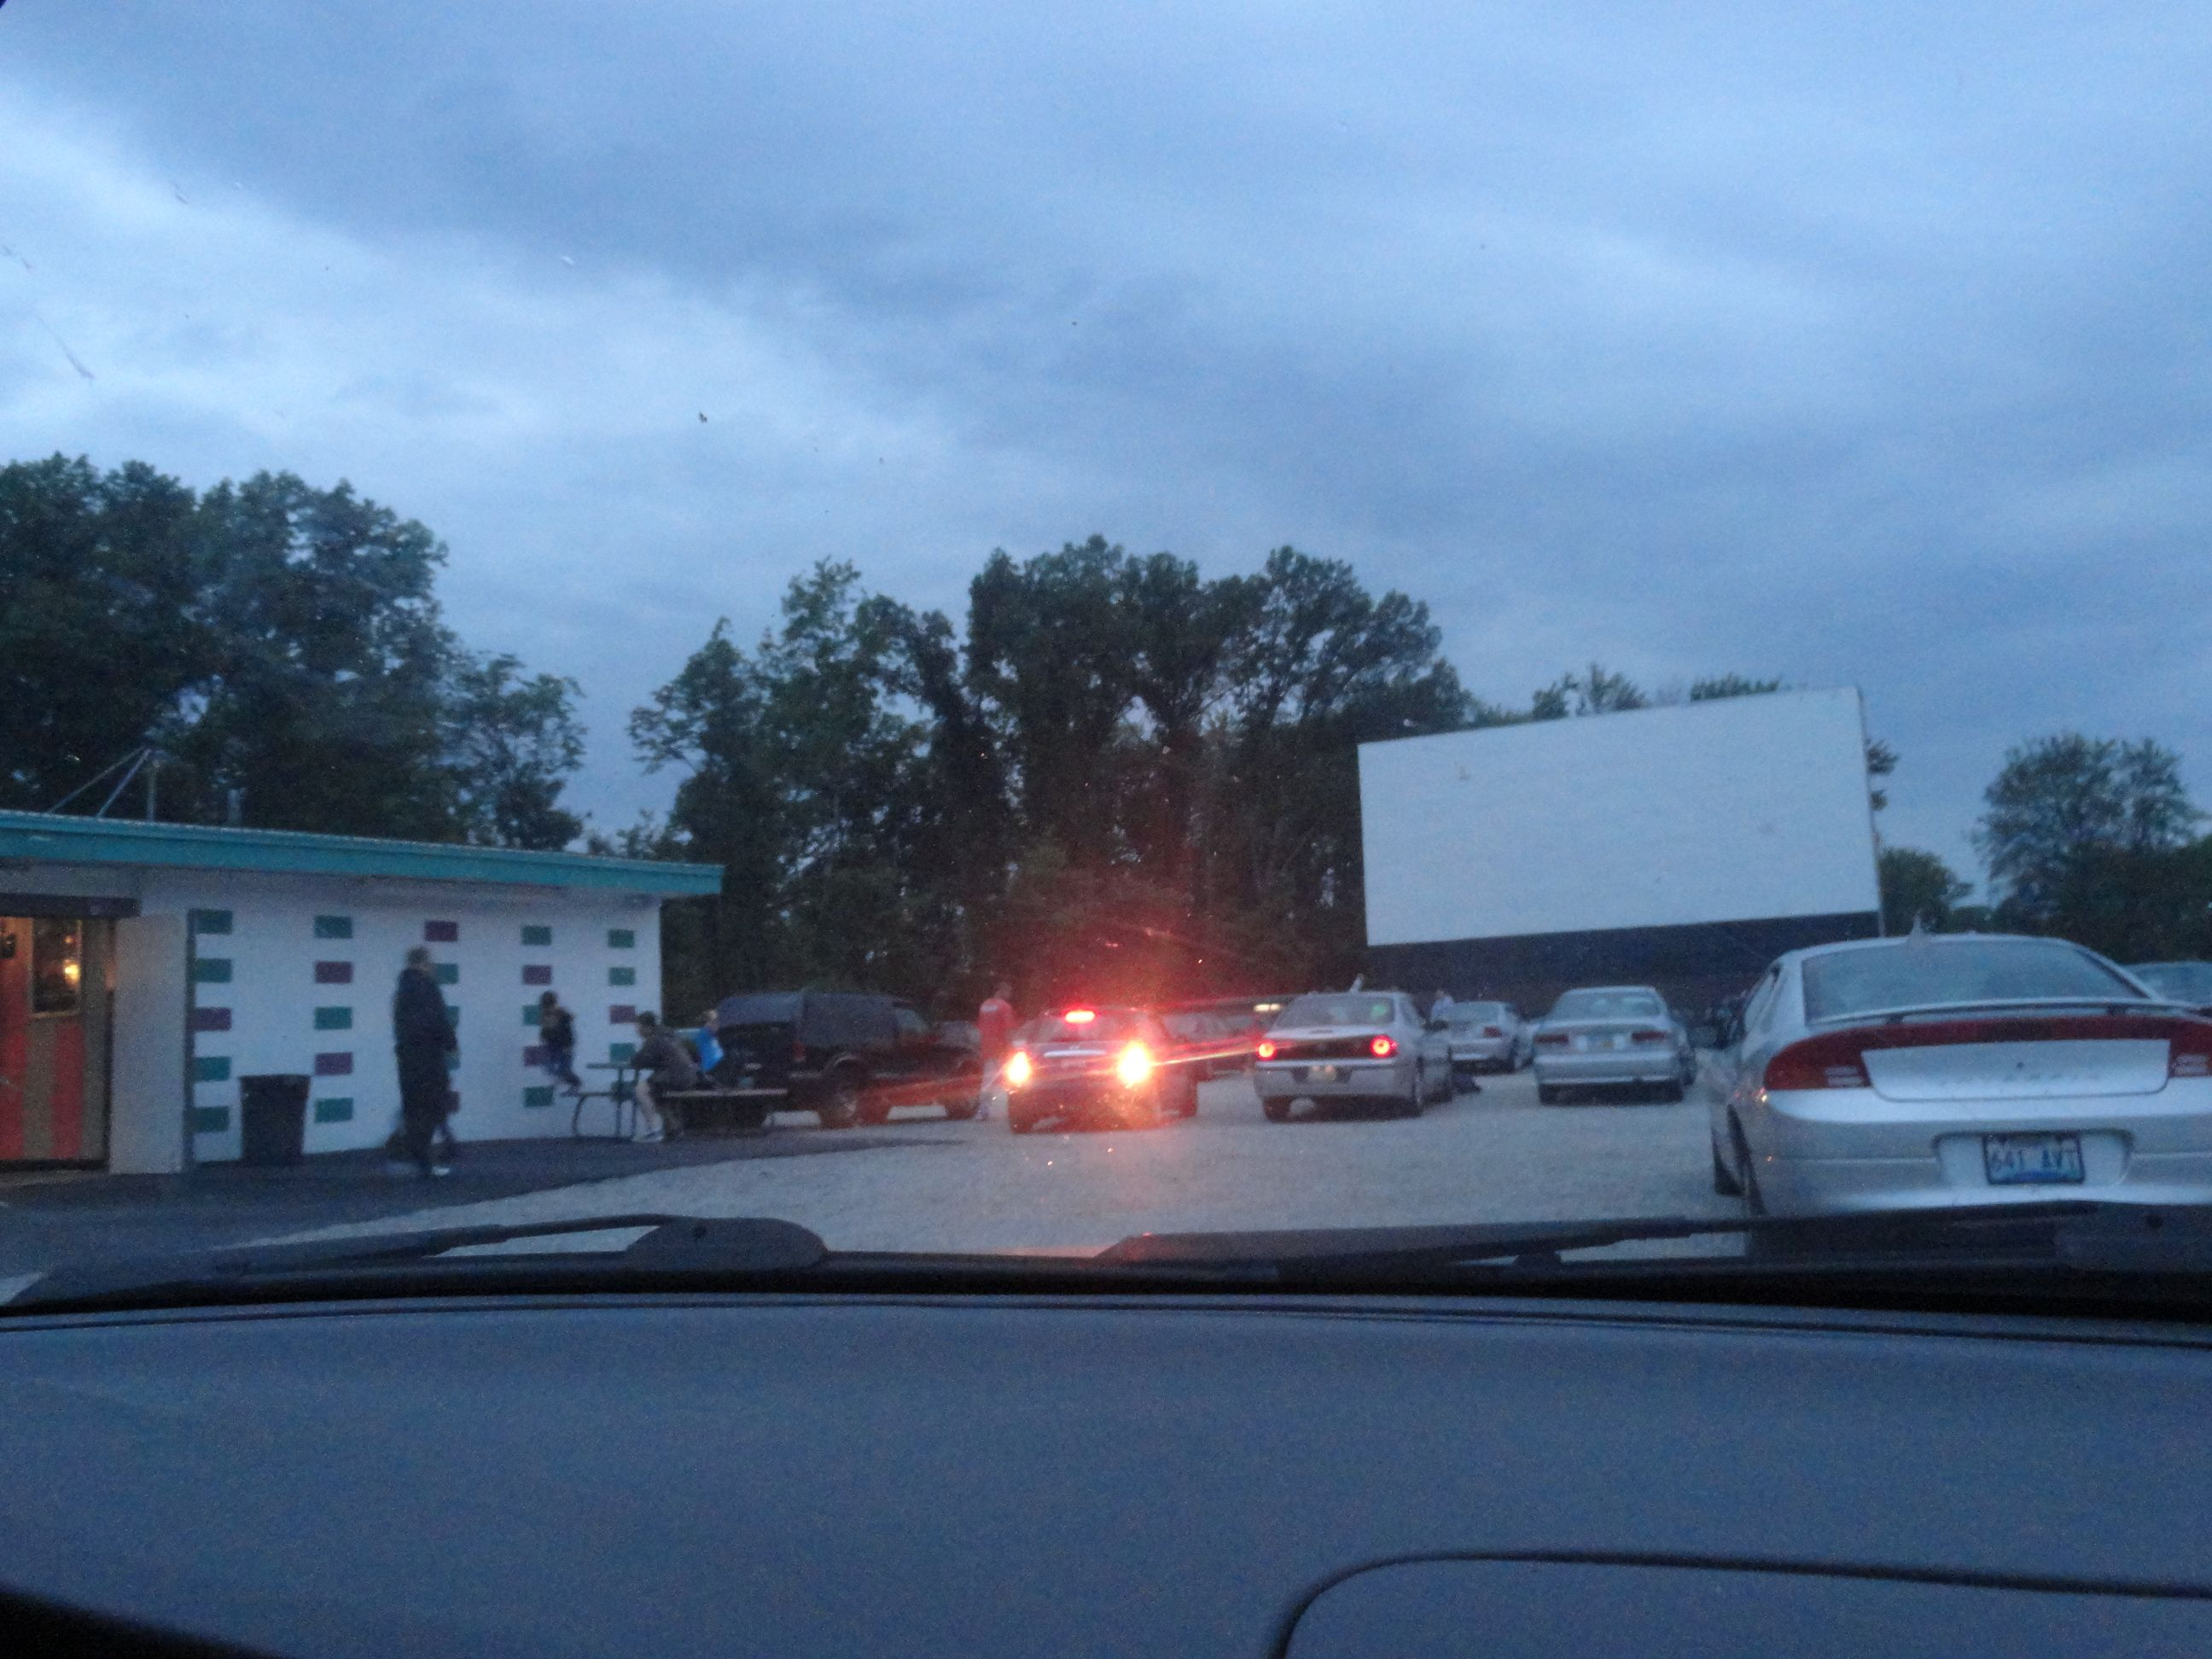 6.2.12starlite drive in movie theater ) Drive in movie